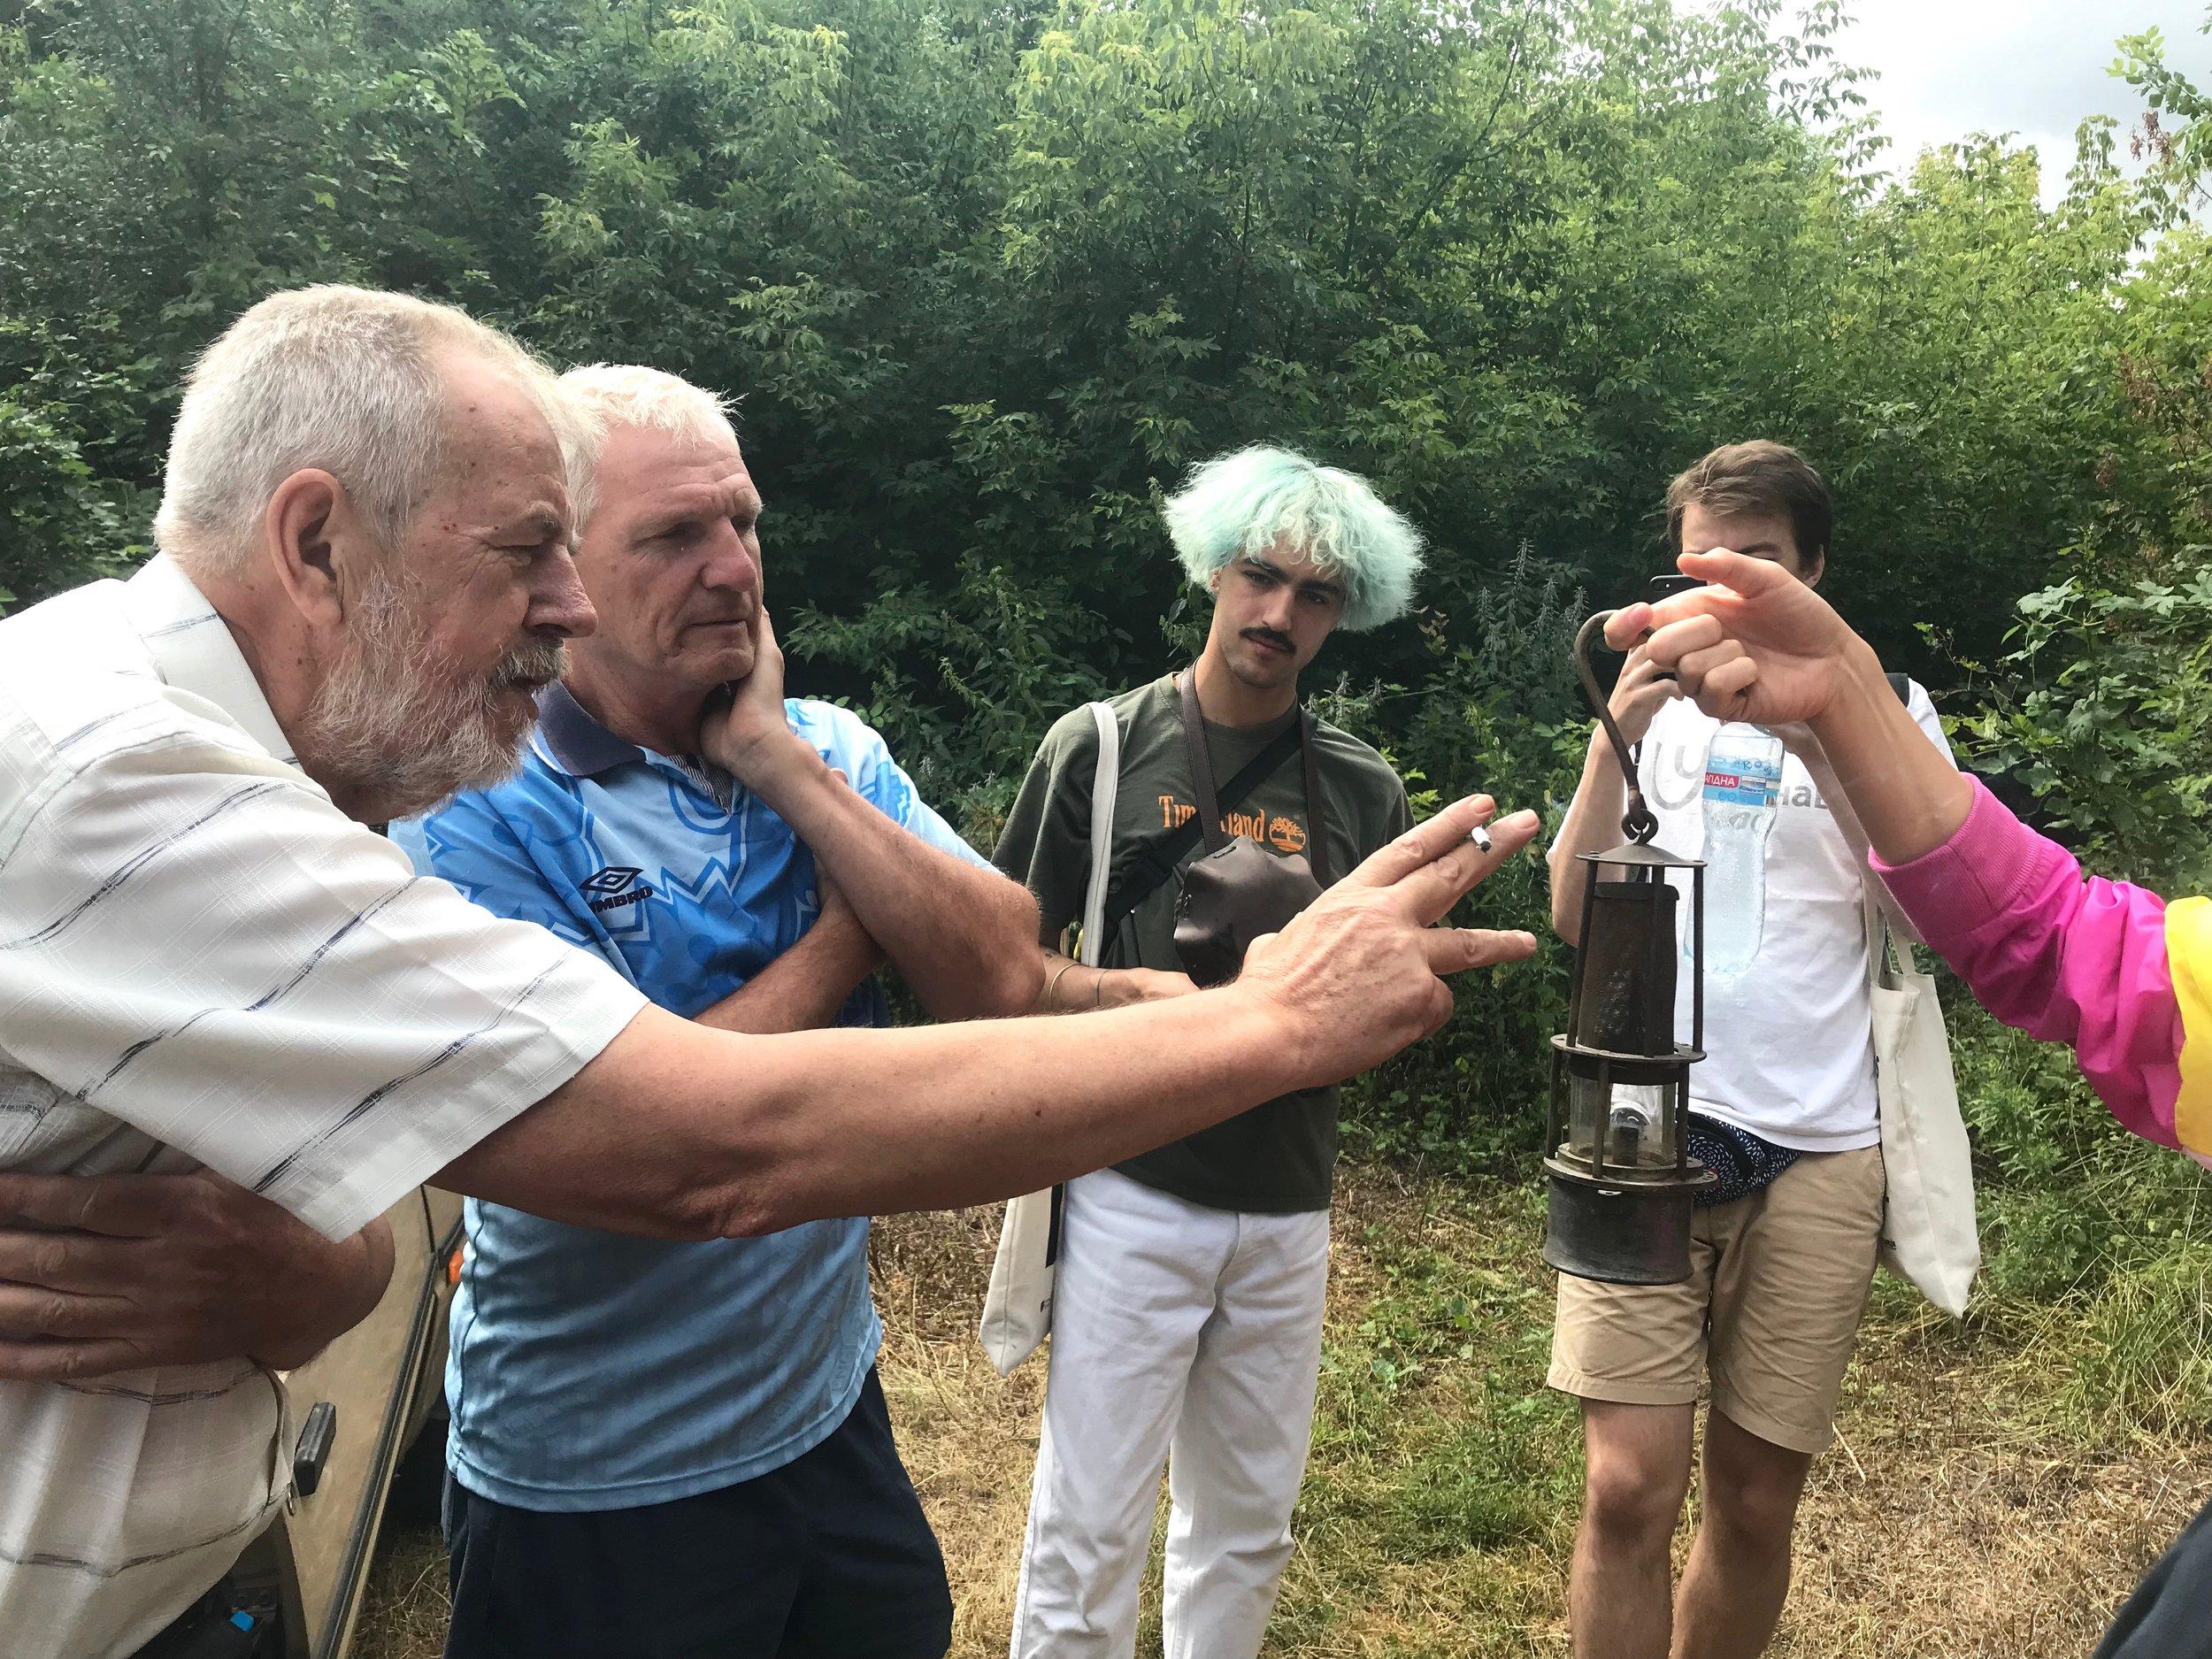 Local Historian Dr. Mykola Lomako and guide Nikola Skuridin show 19th c. mining equipment